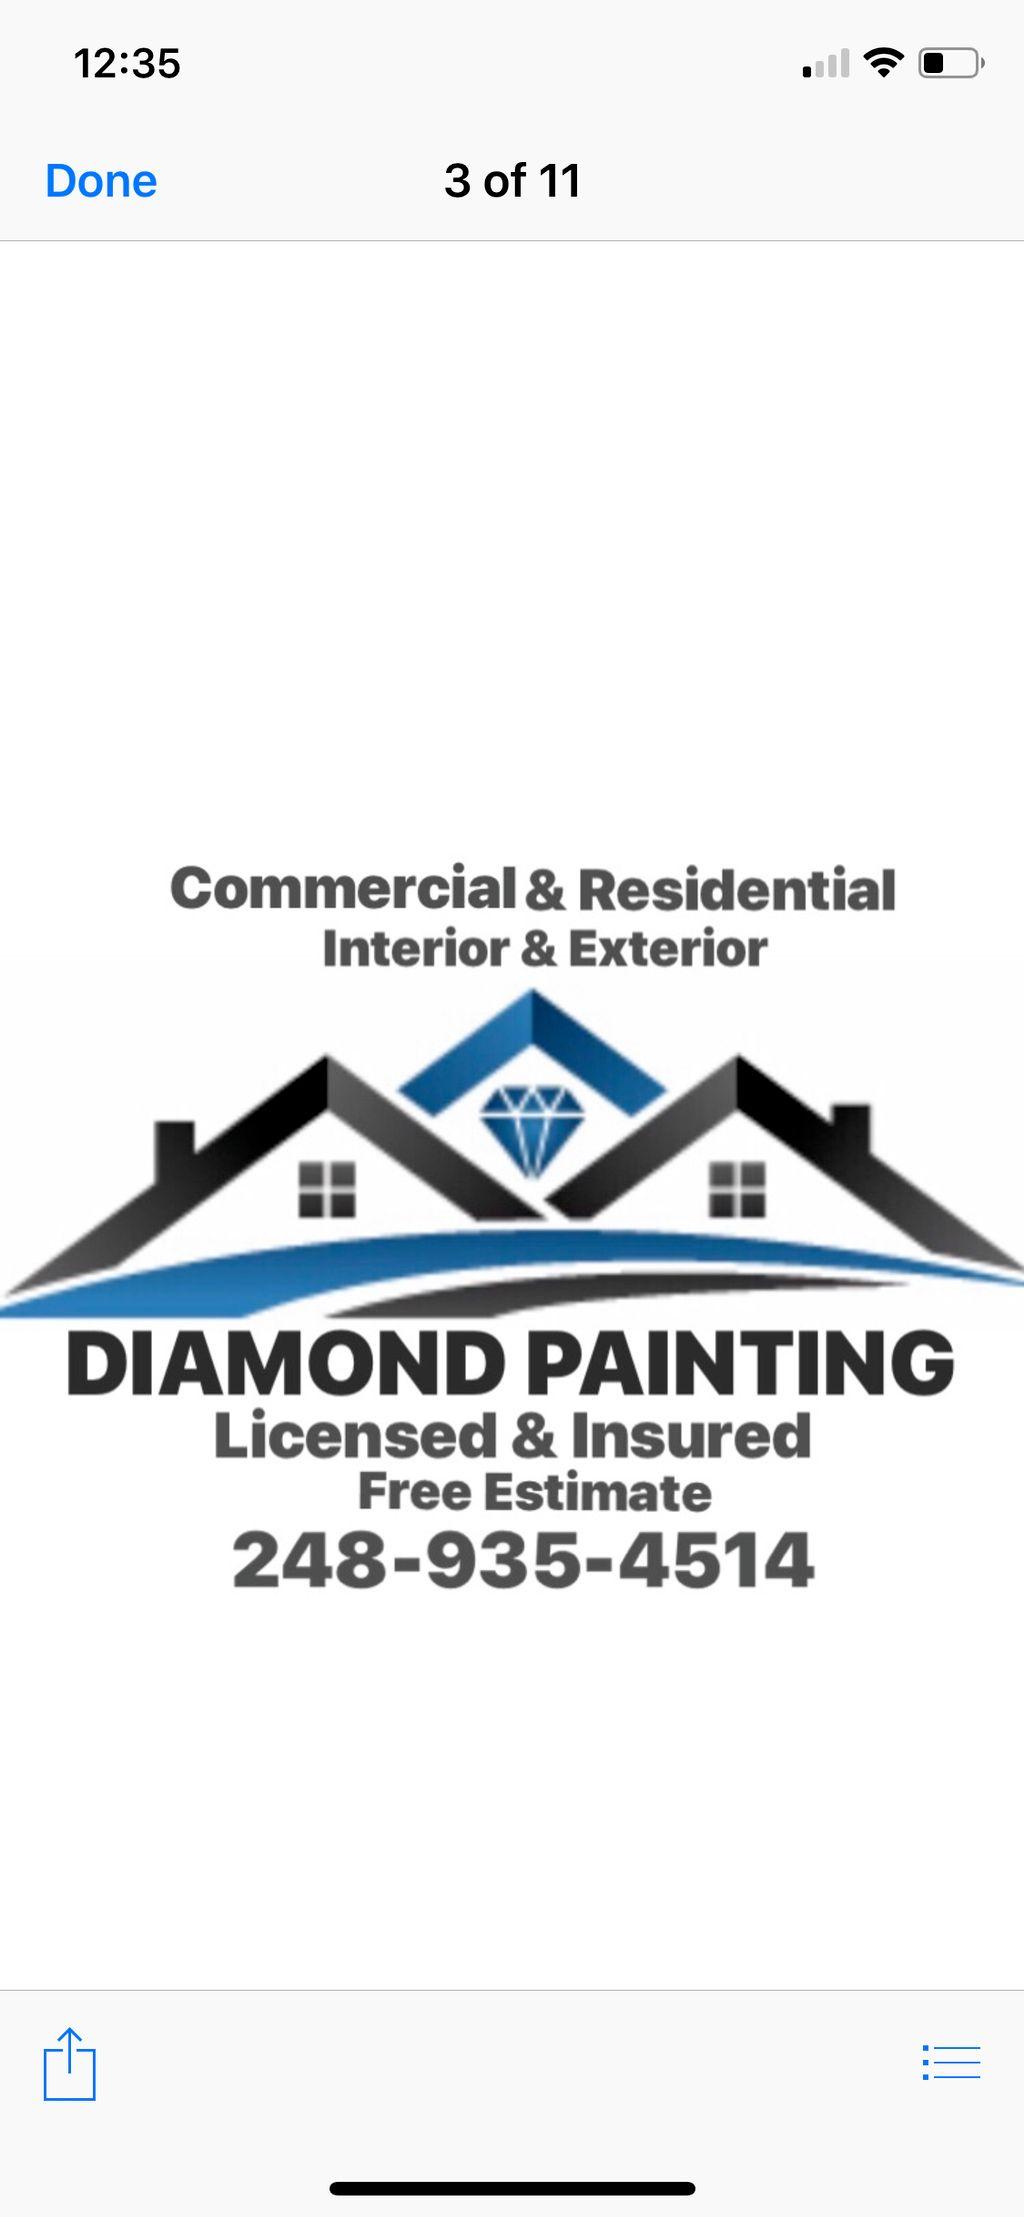 Diamond Painting LLC